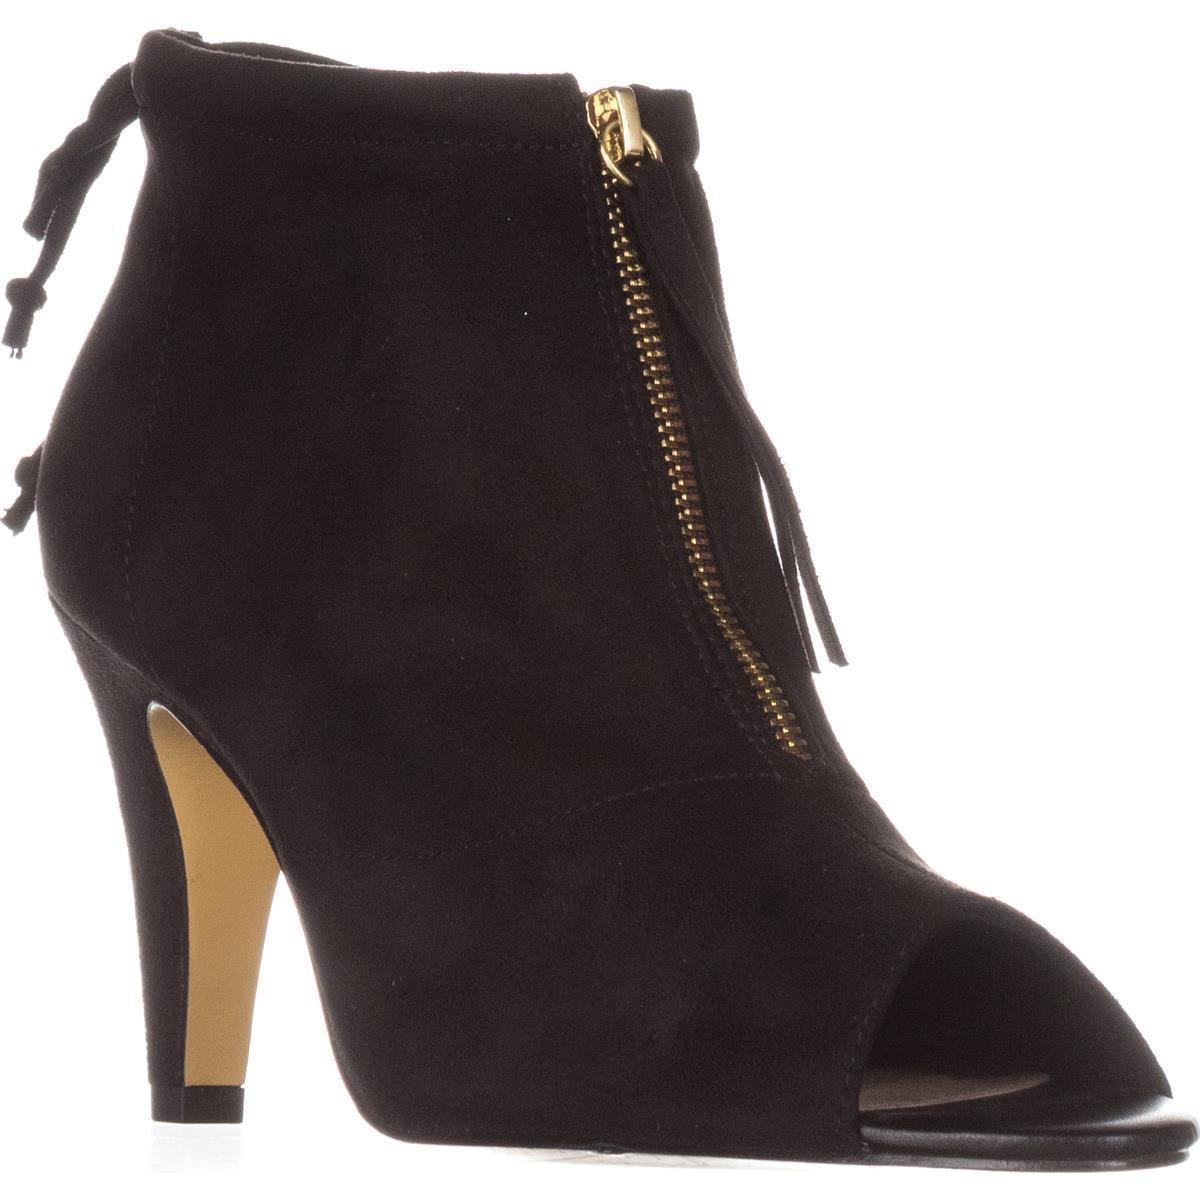 Womens Bella Vita Nicky II Peep-Toe Ankle Boots, Black by Bella Vita